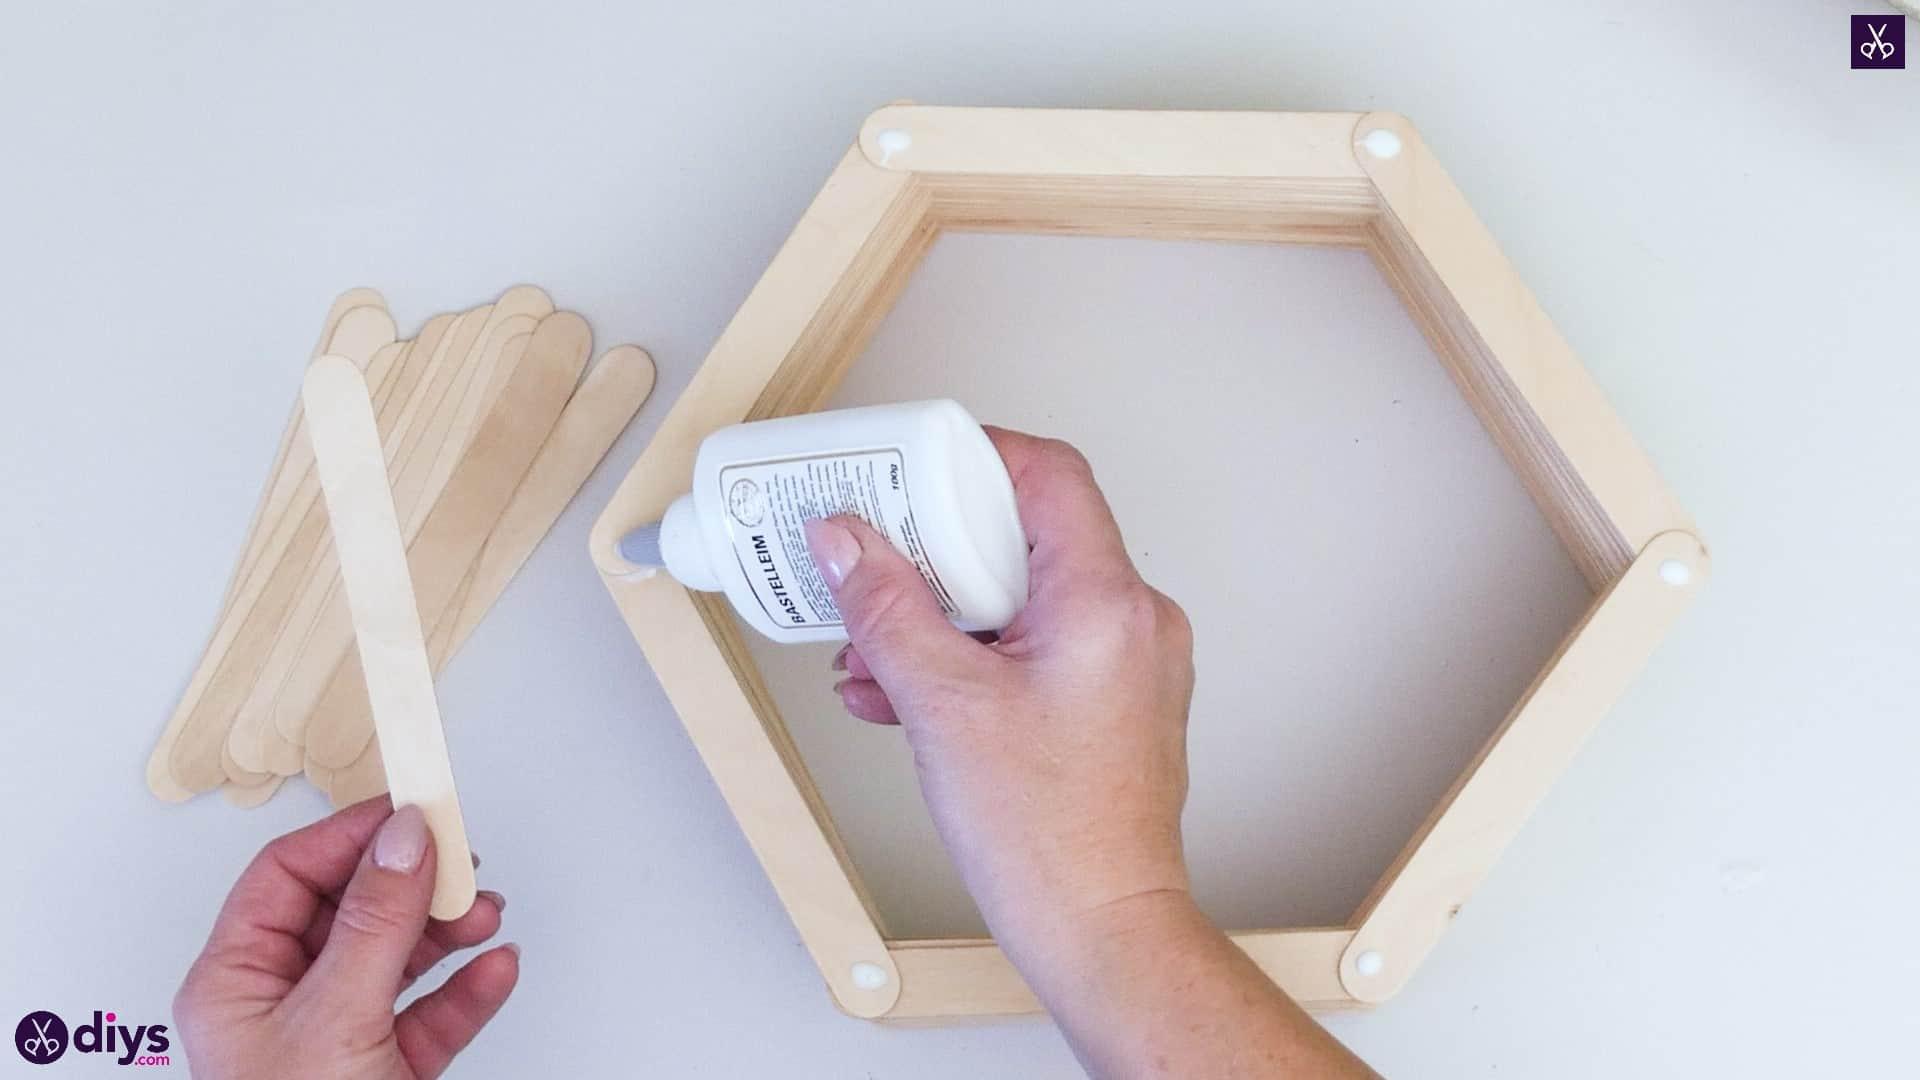 Diy popsicle stick hexagon shelf step 3